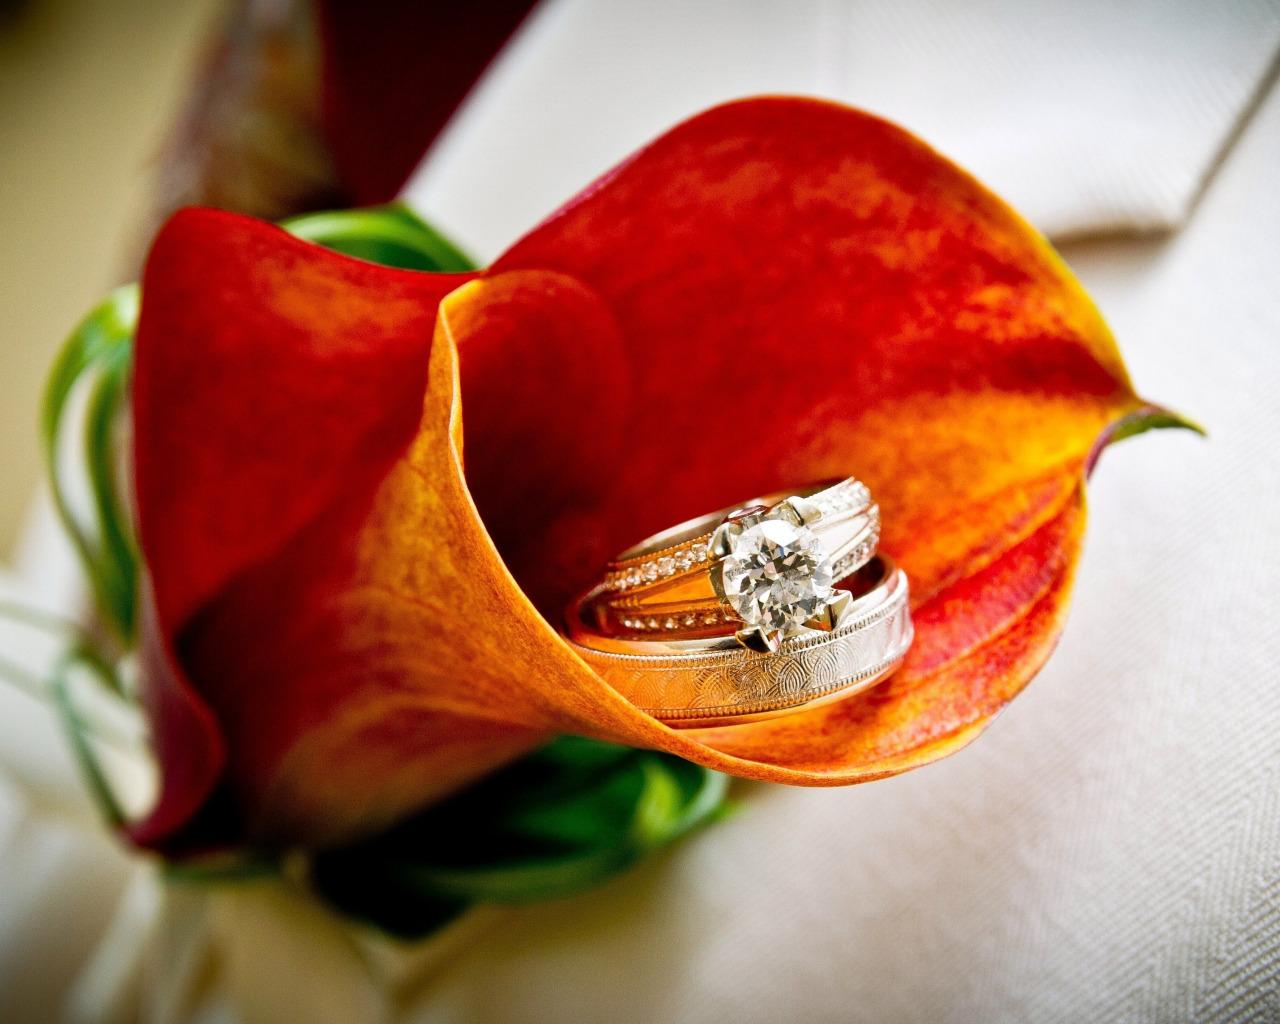 Фото с кольцом на цветах